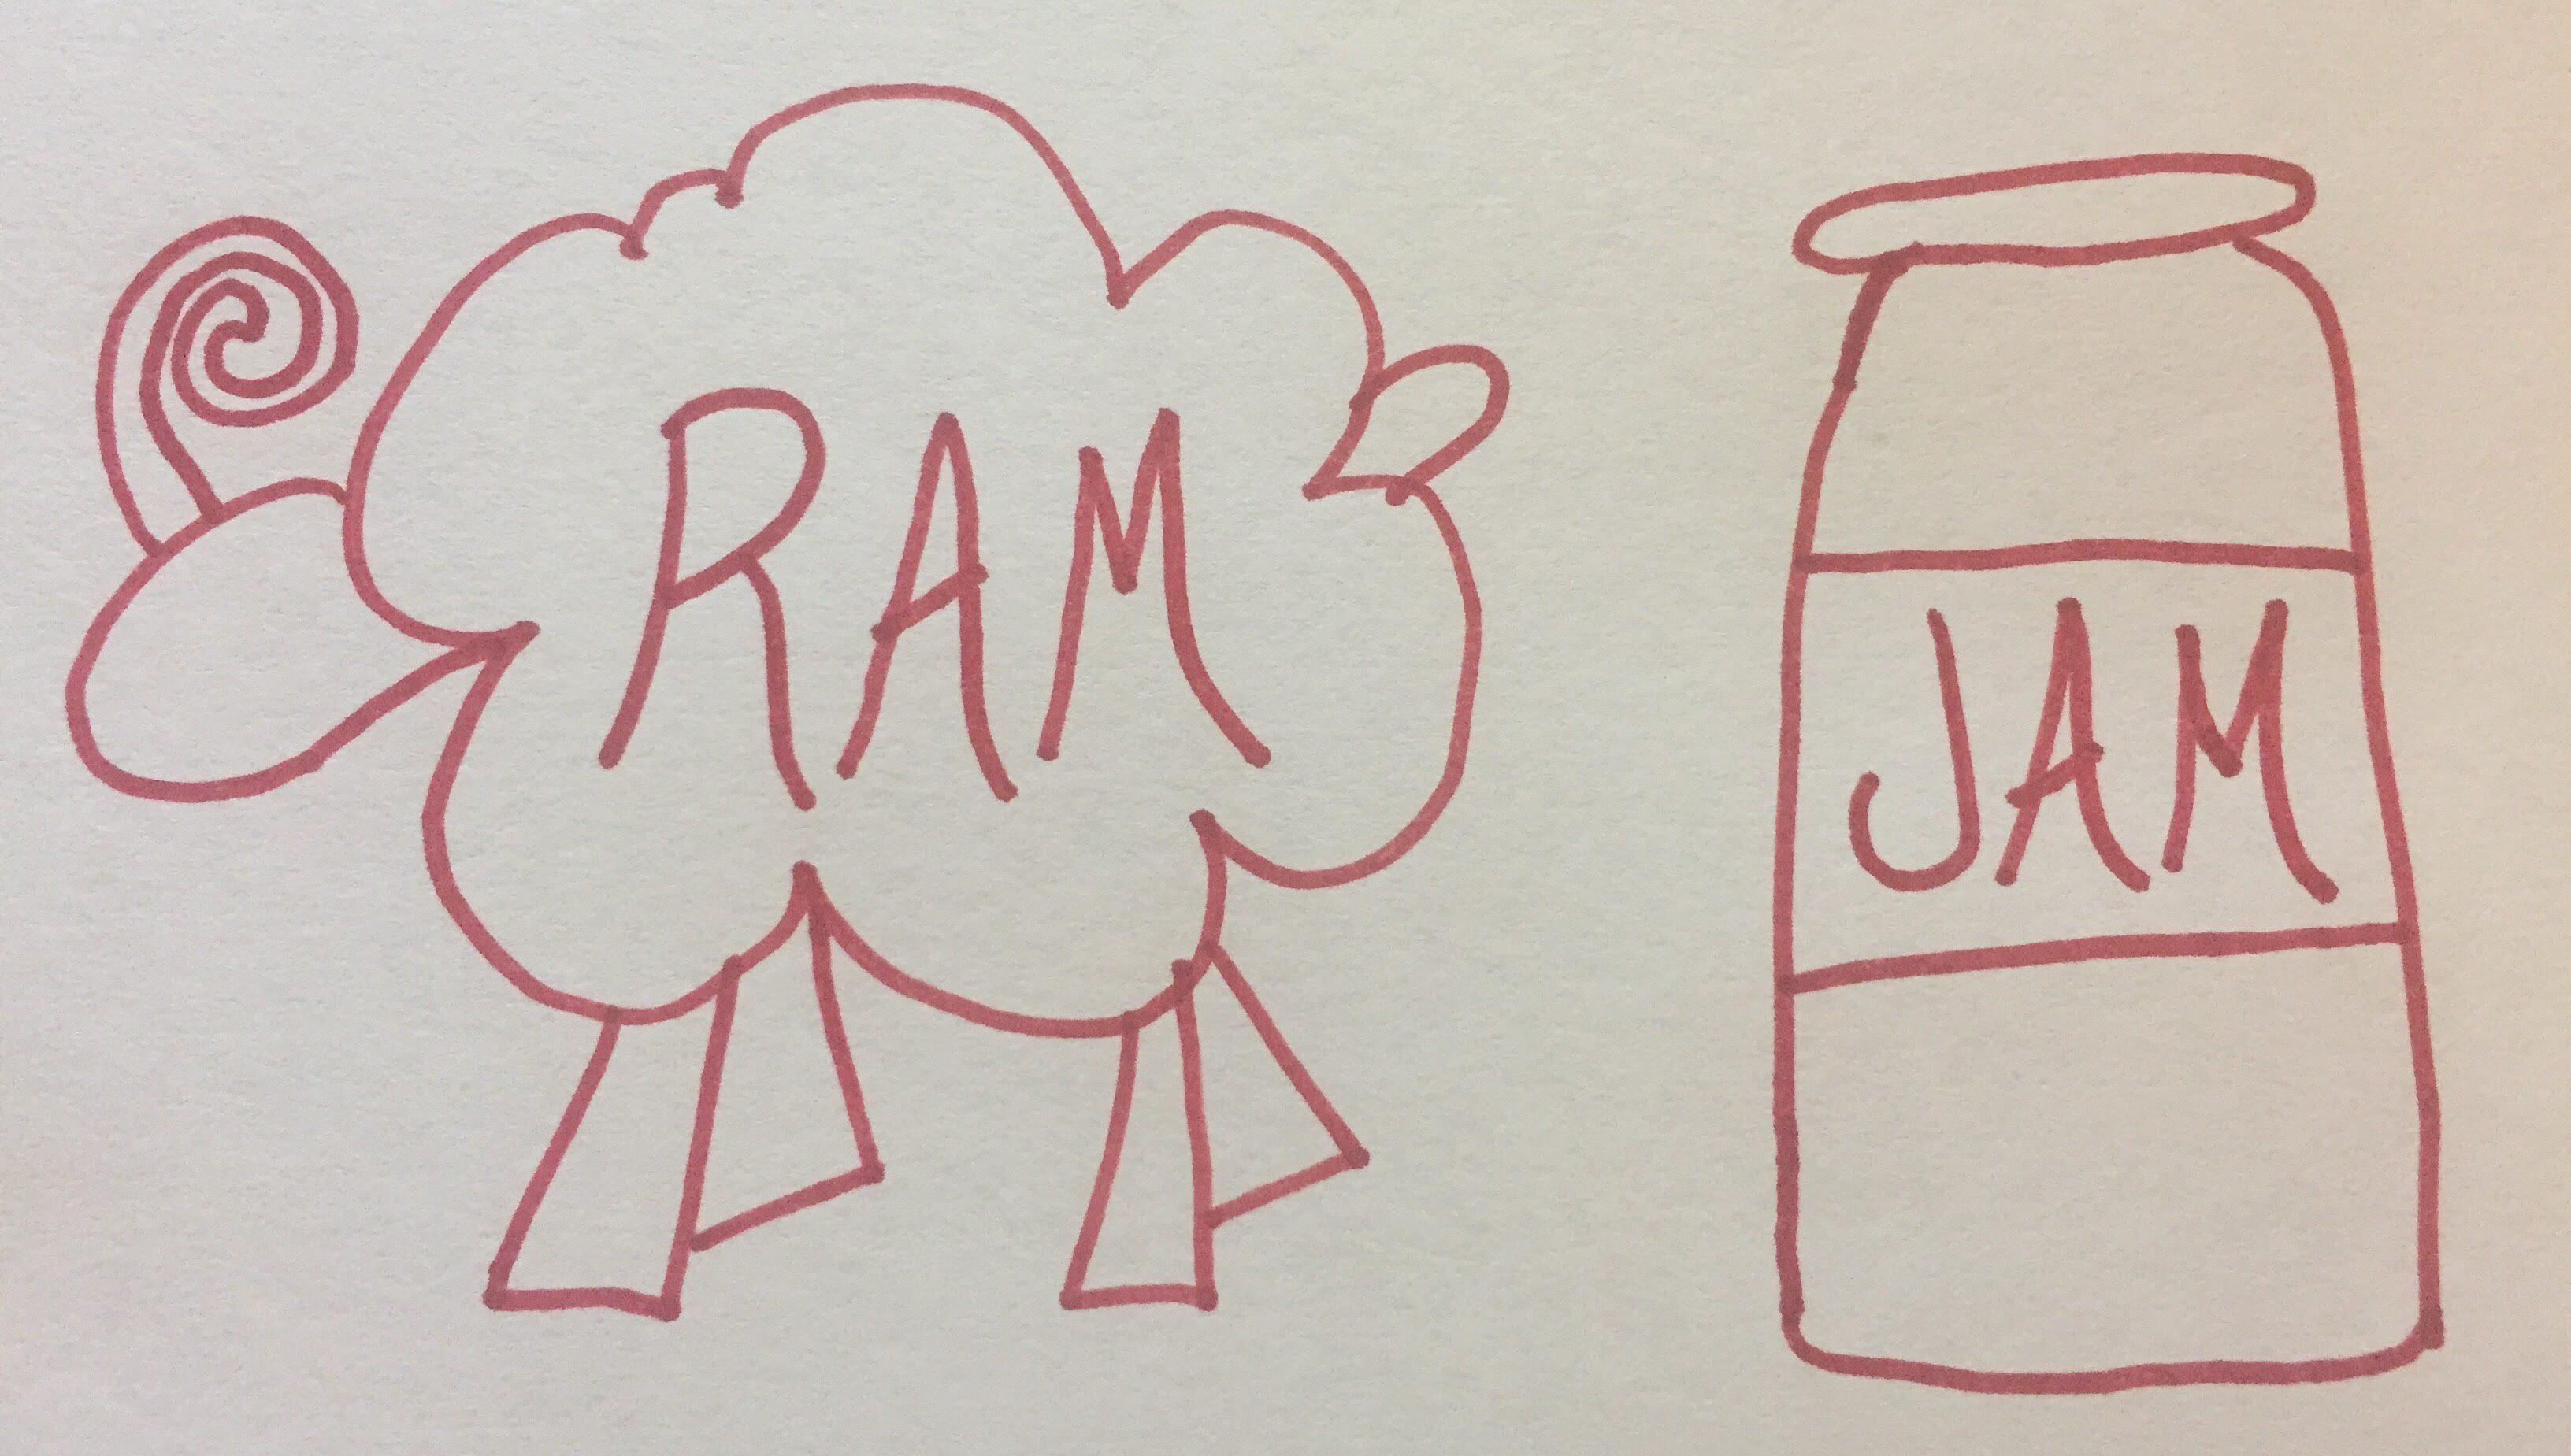 Mrs. Ram's Jams